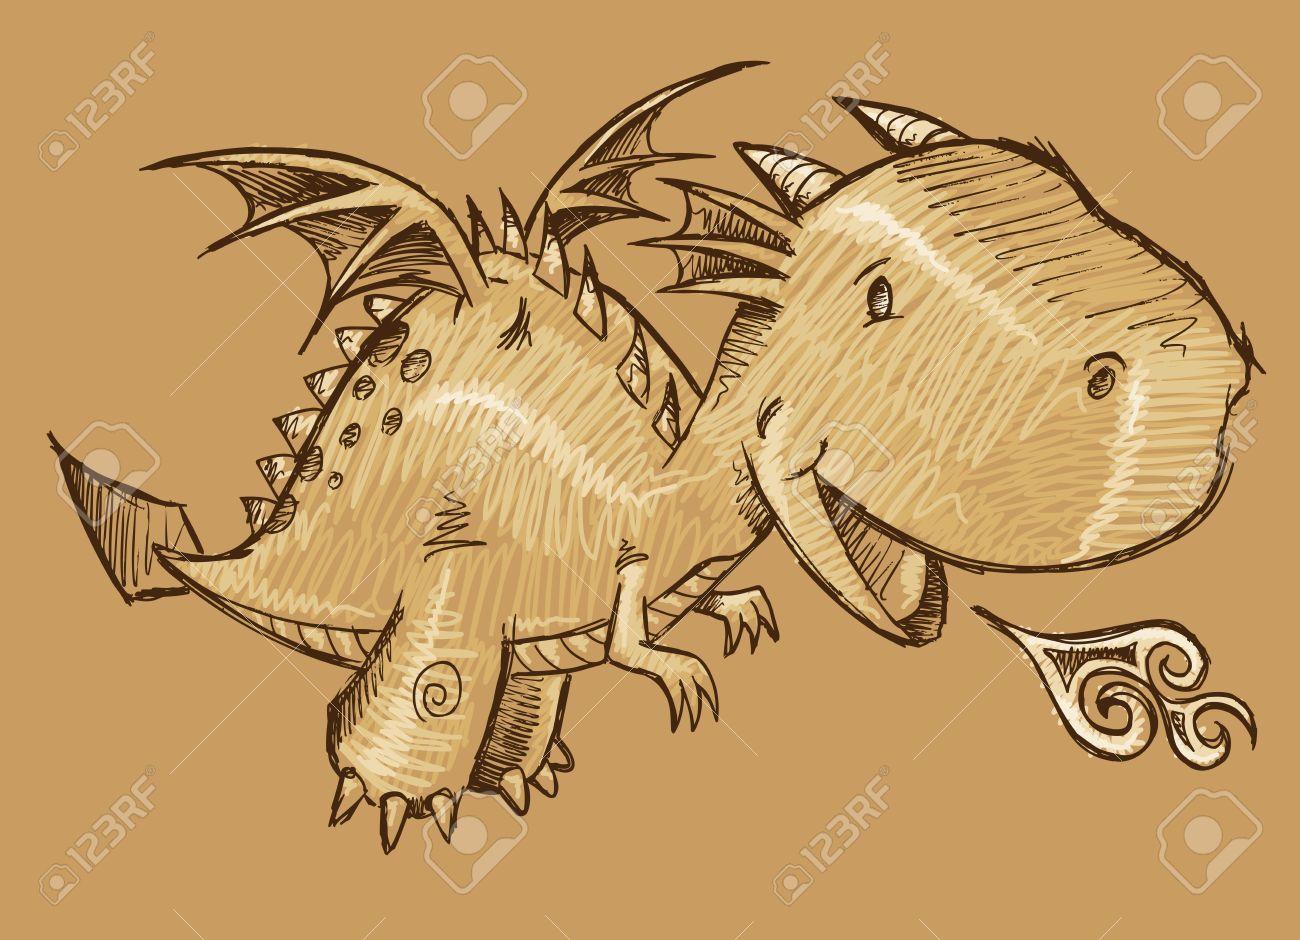 Great Cute Dragon Sketch Vector Art Stock Vector   19798205